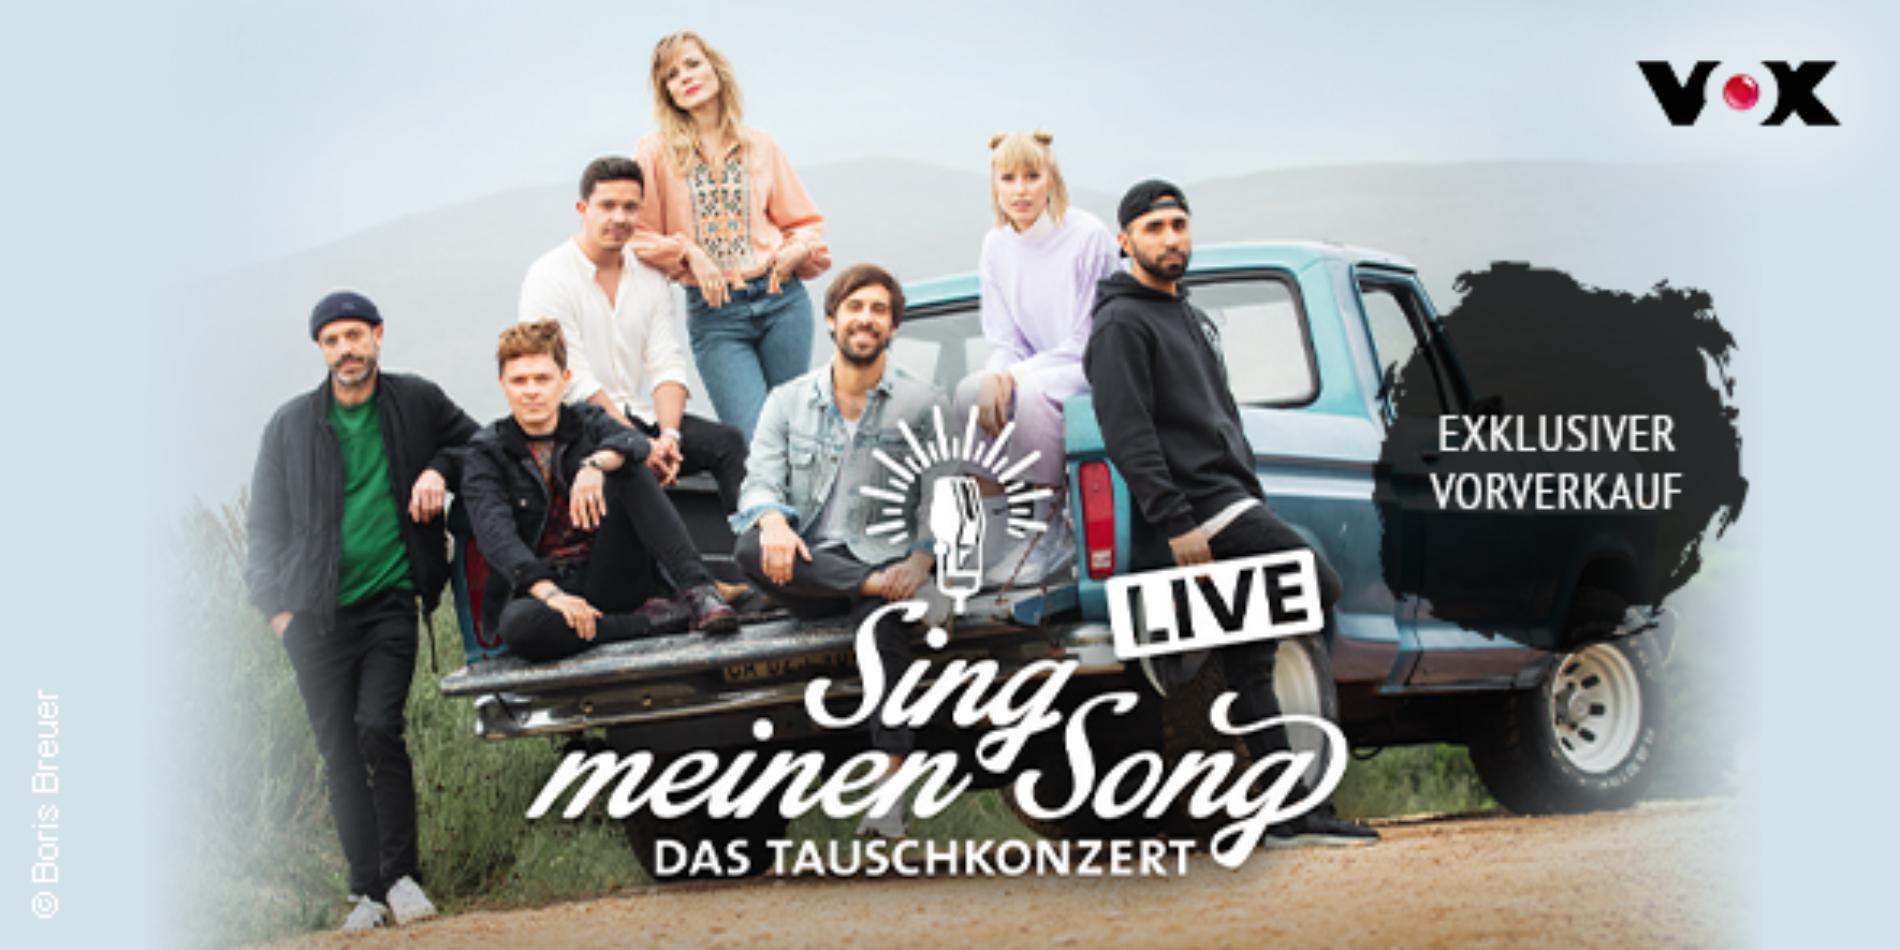 Sing meinen Song – das Tauschkonzert – Live 2021